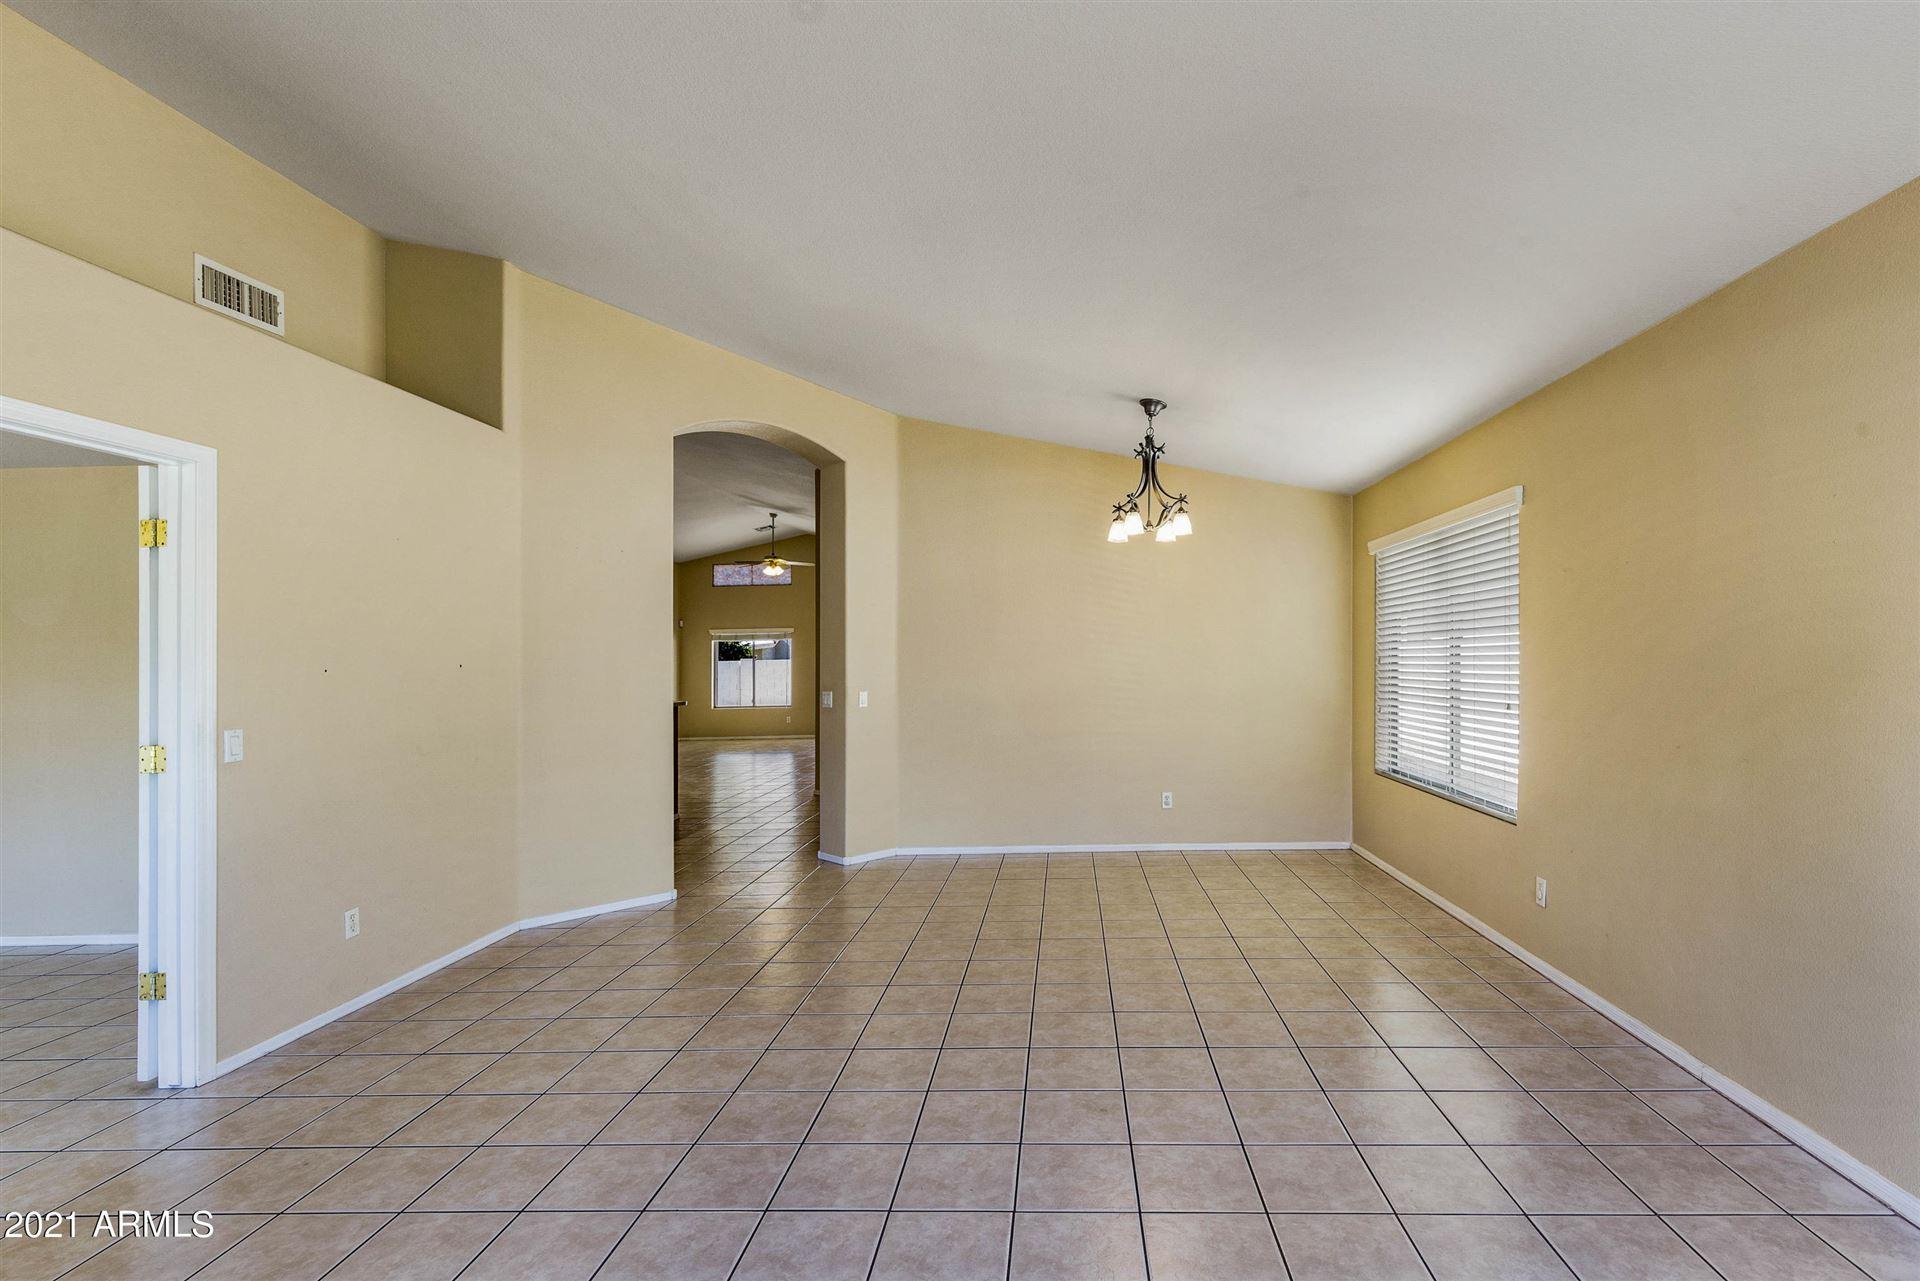 Photo of 712 S JACOB Street, Gilbert, AZ 85296 (MLS # 6202035)